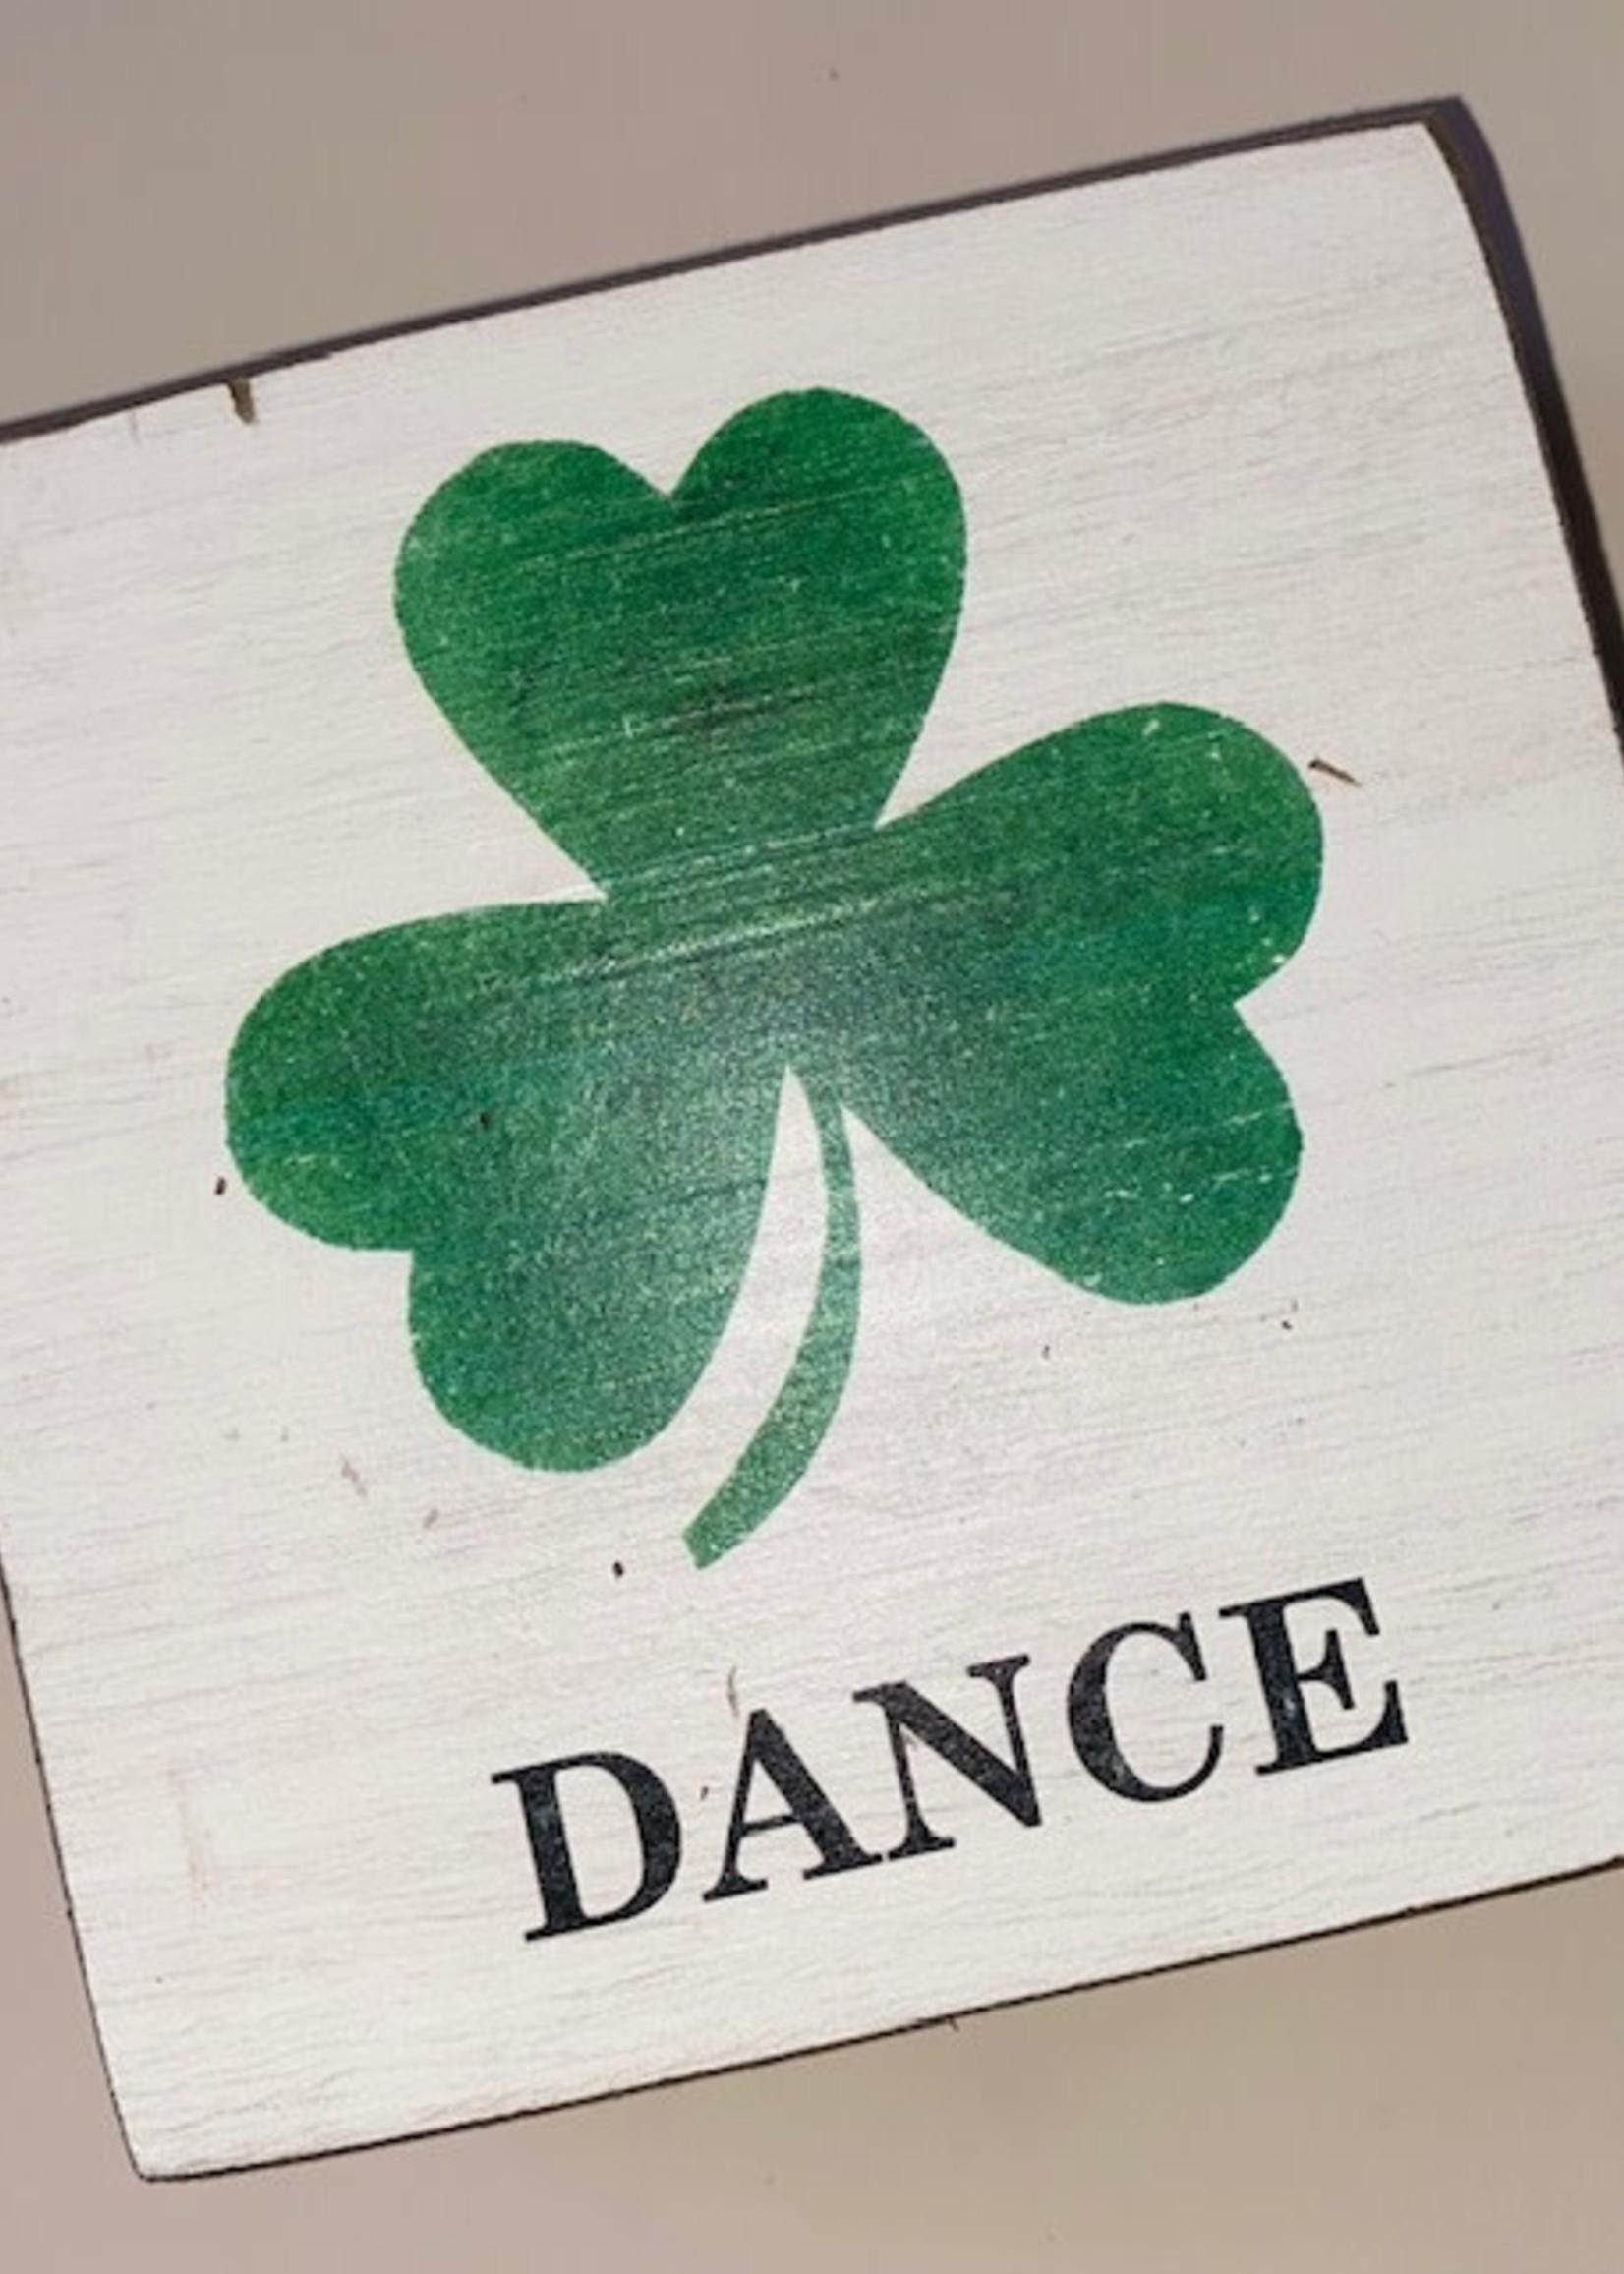 Rustic Marlin Irish Dance Square Block